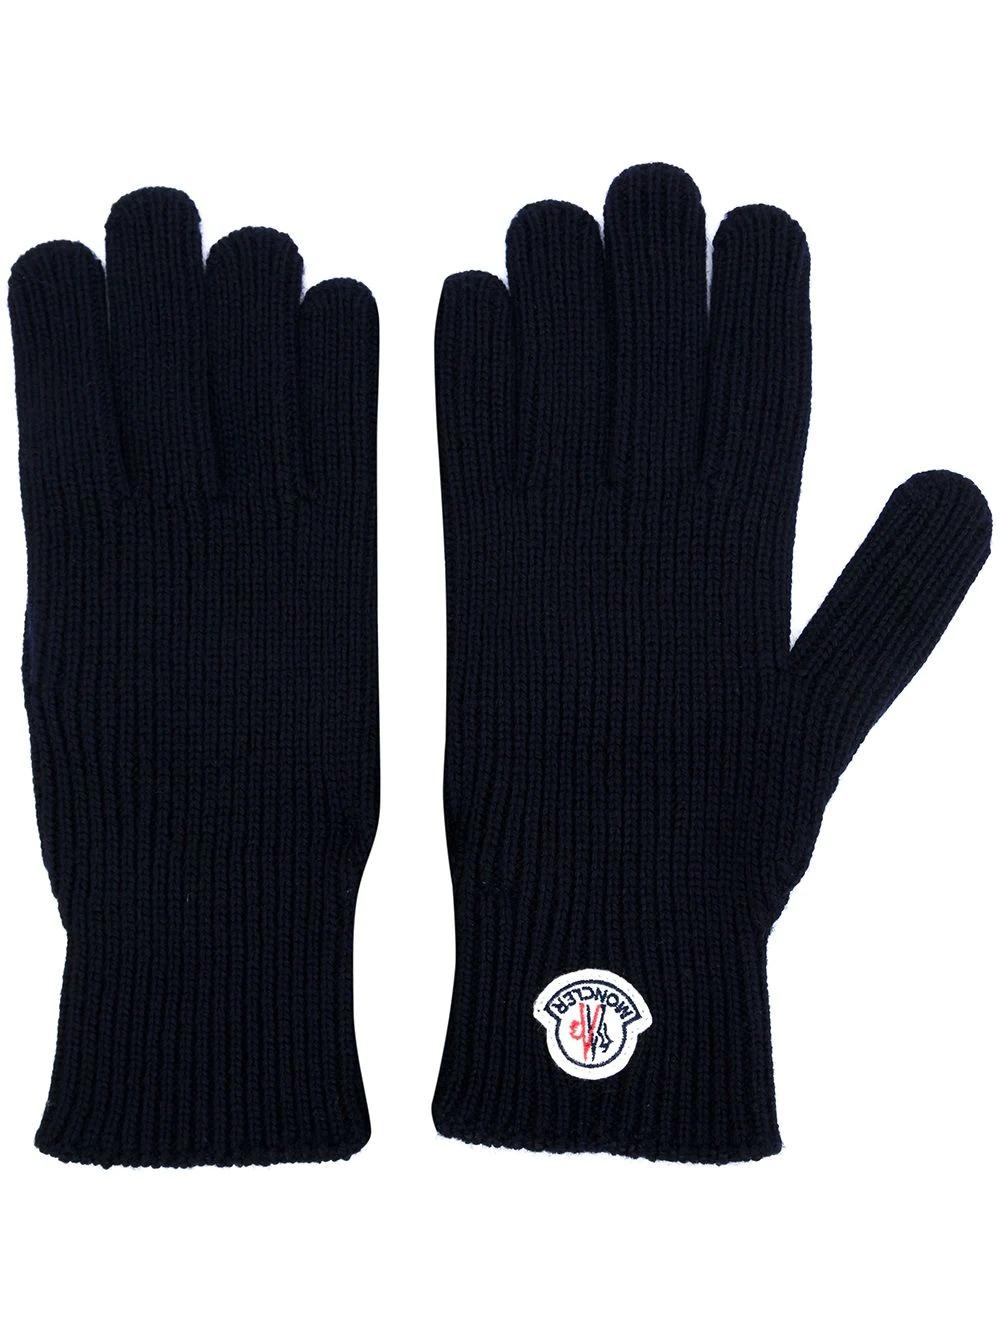 MONCLER | перчатки с логотипом | Clouty